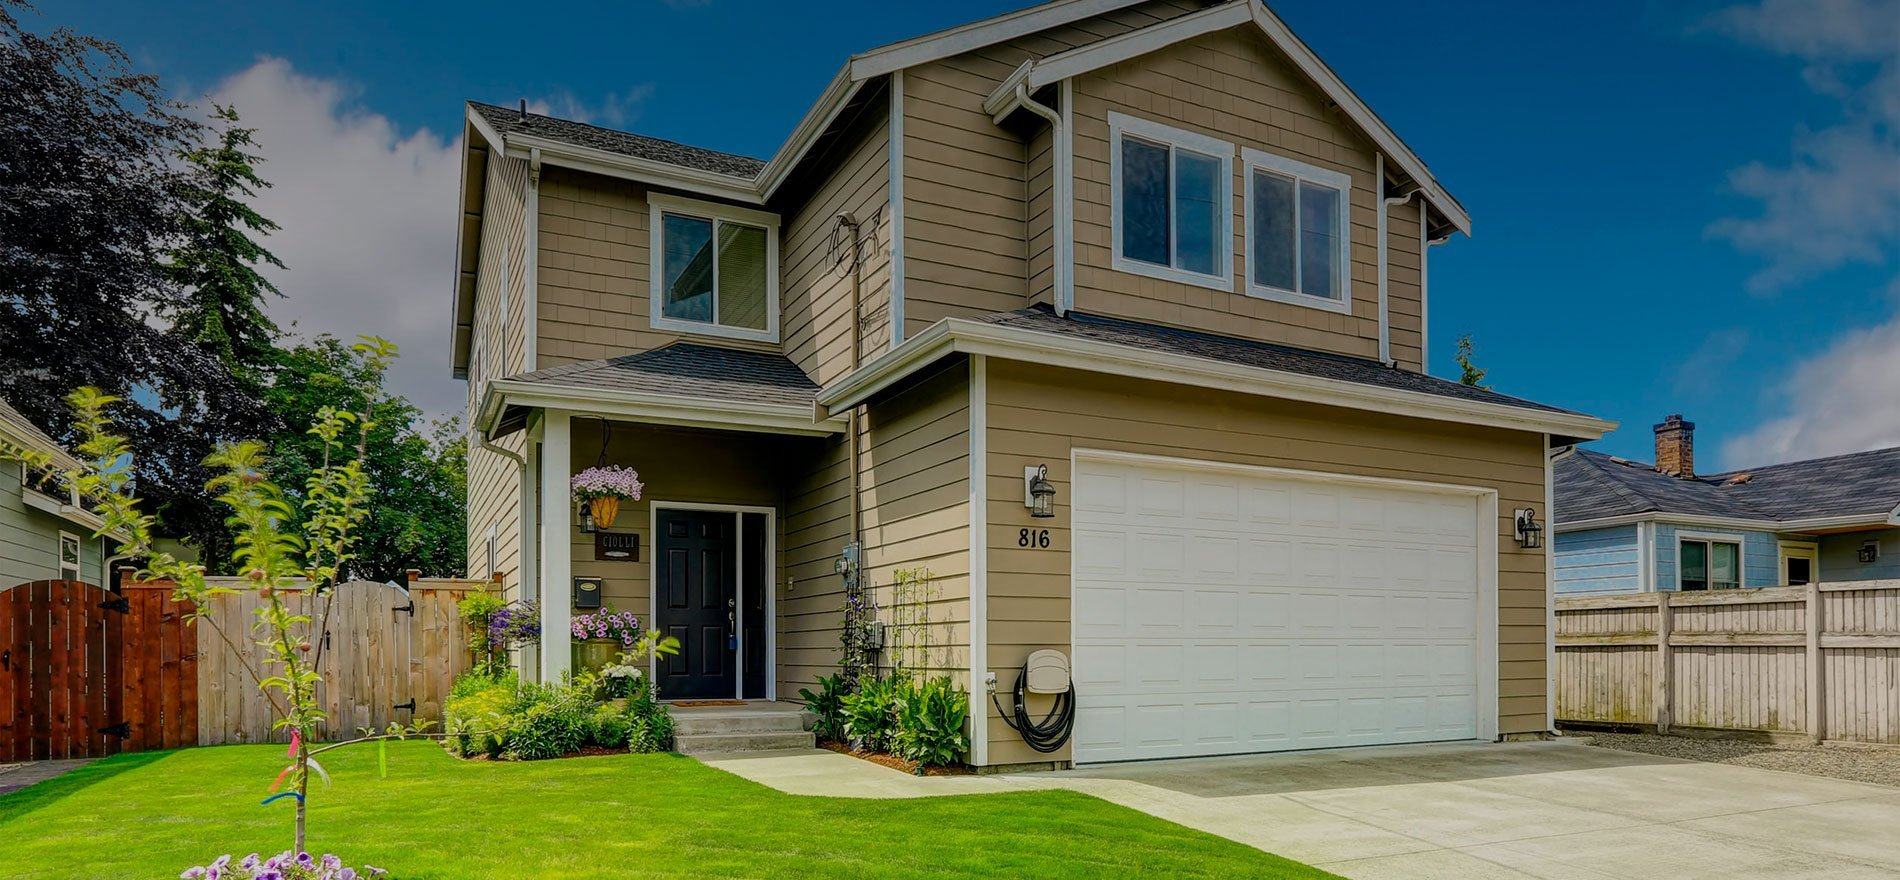 Diver lake homes for sale nanaimo real estate